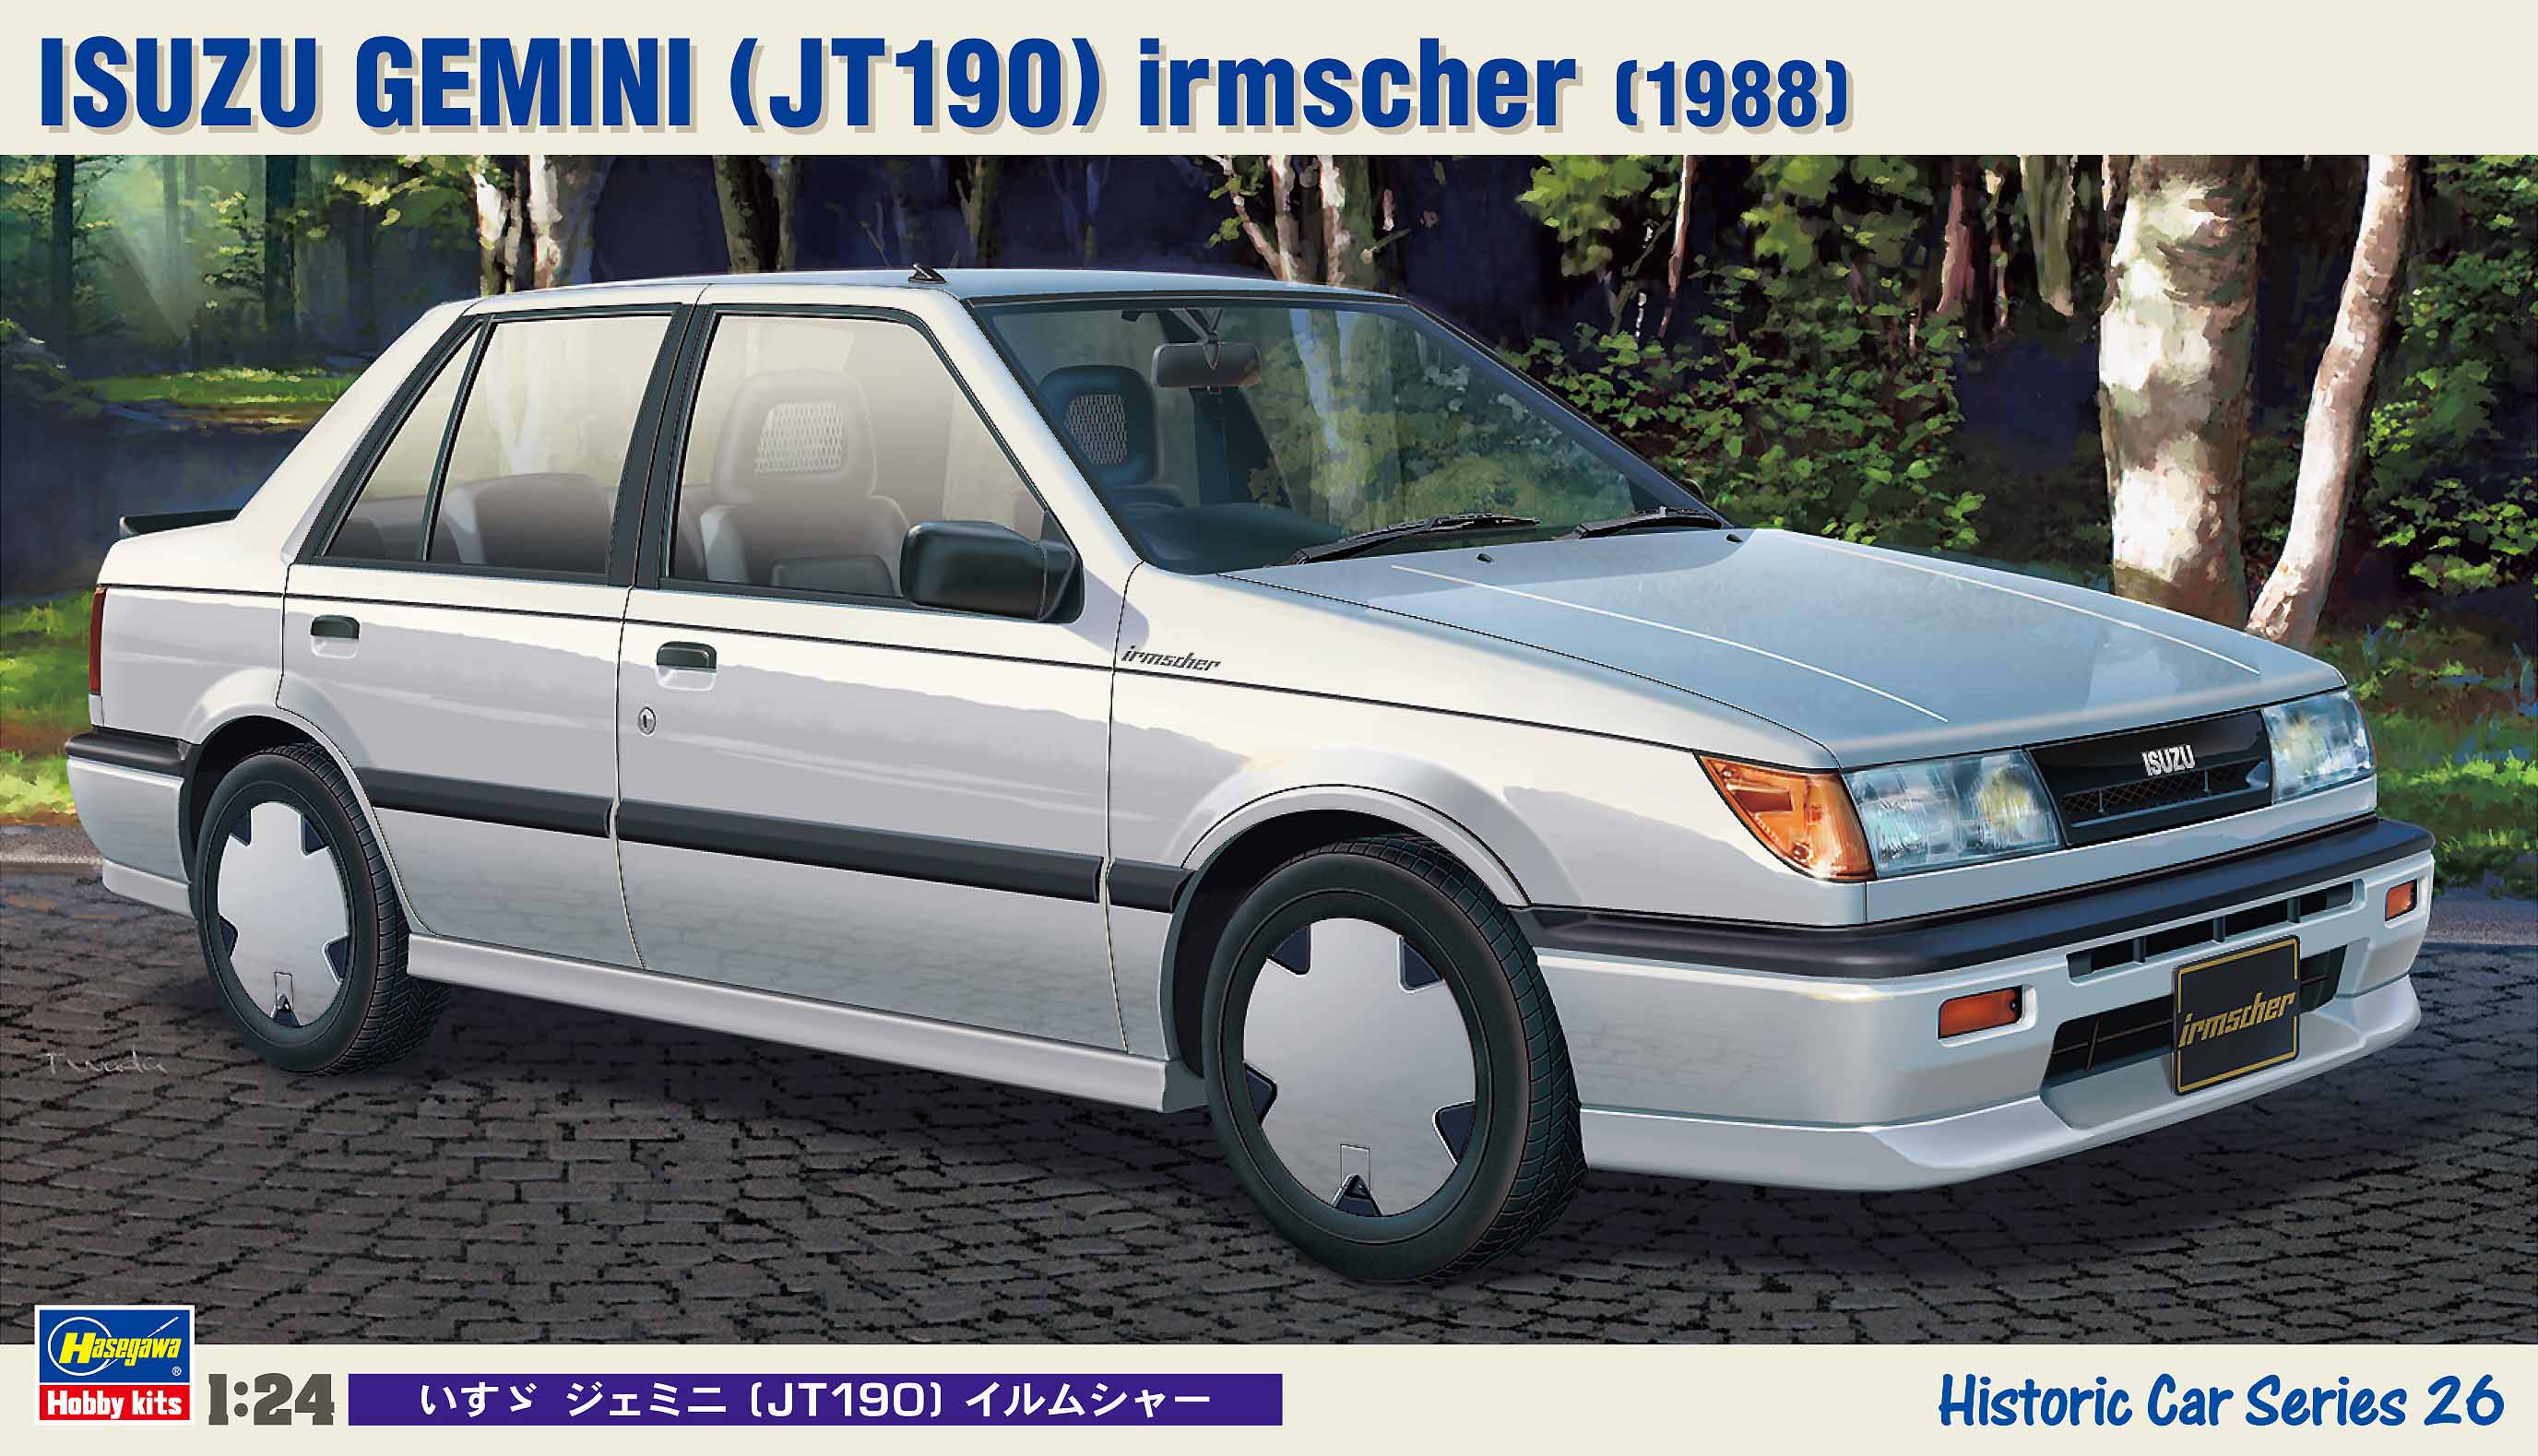 Hasegawa Isuzu Gemini (Jt190) Irmscher HC26